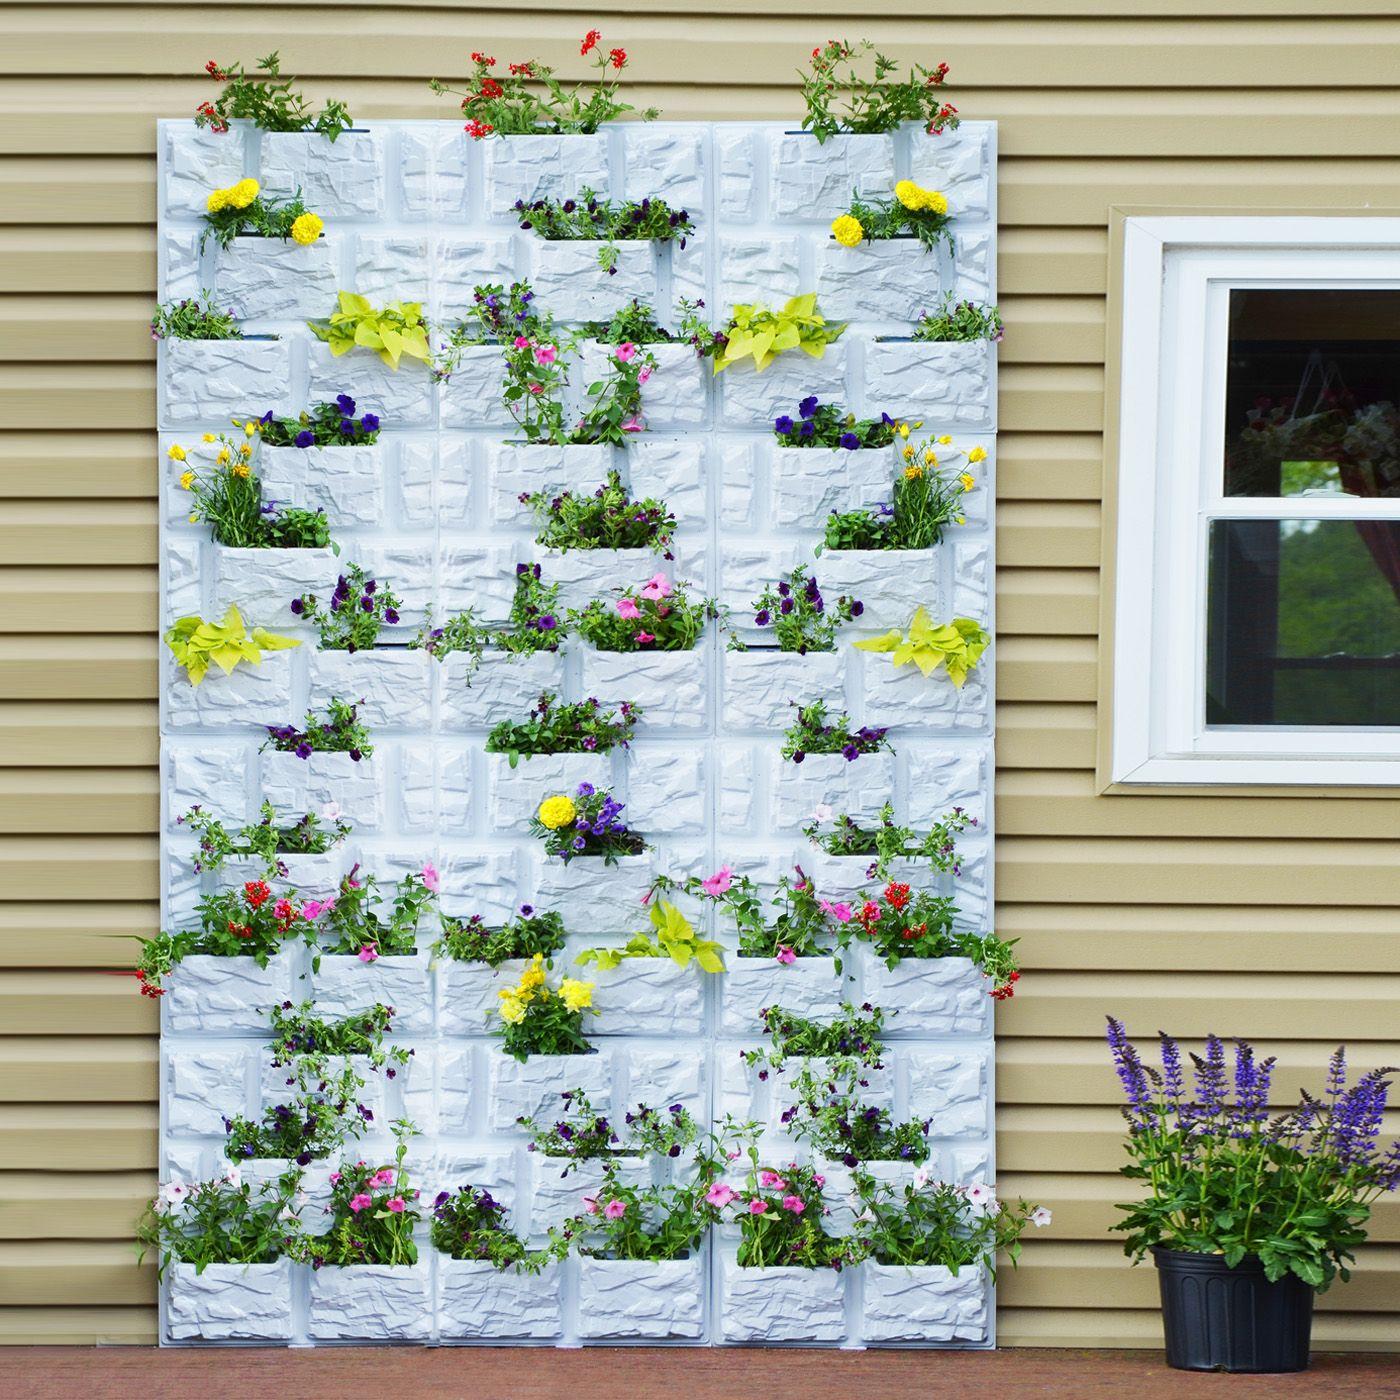 Shop Palram Canada 702421 PlantScape Vertical Garden at